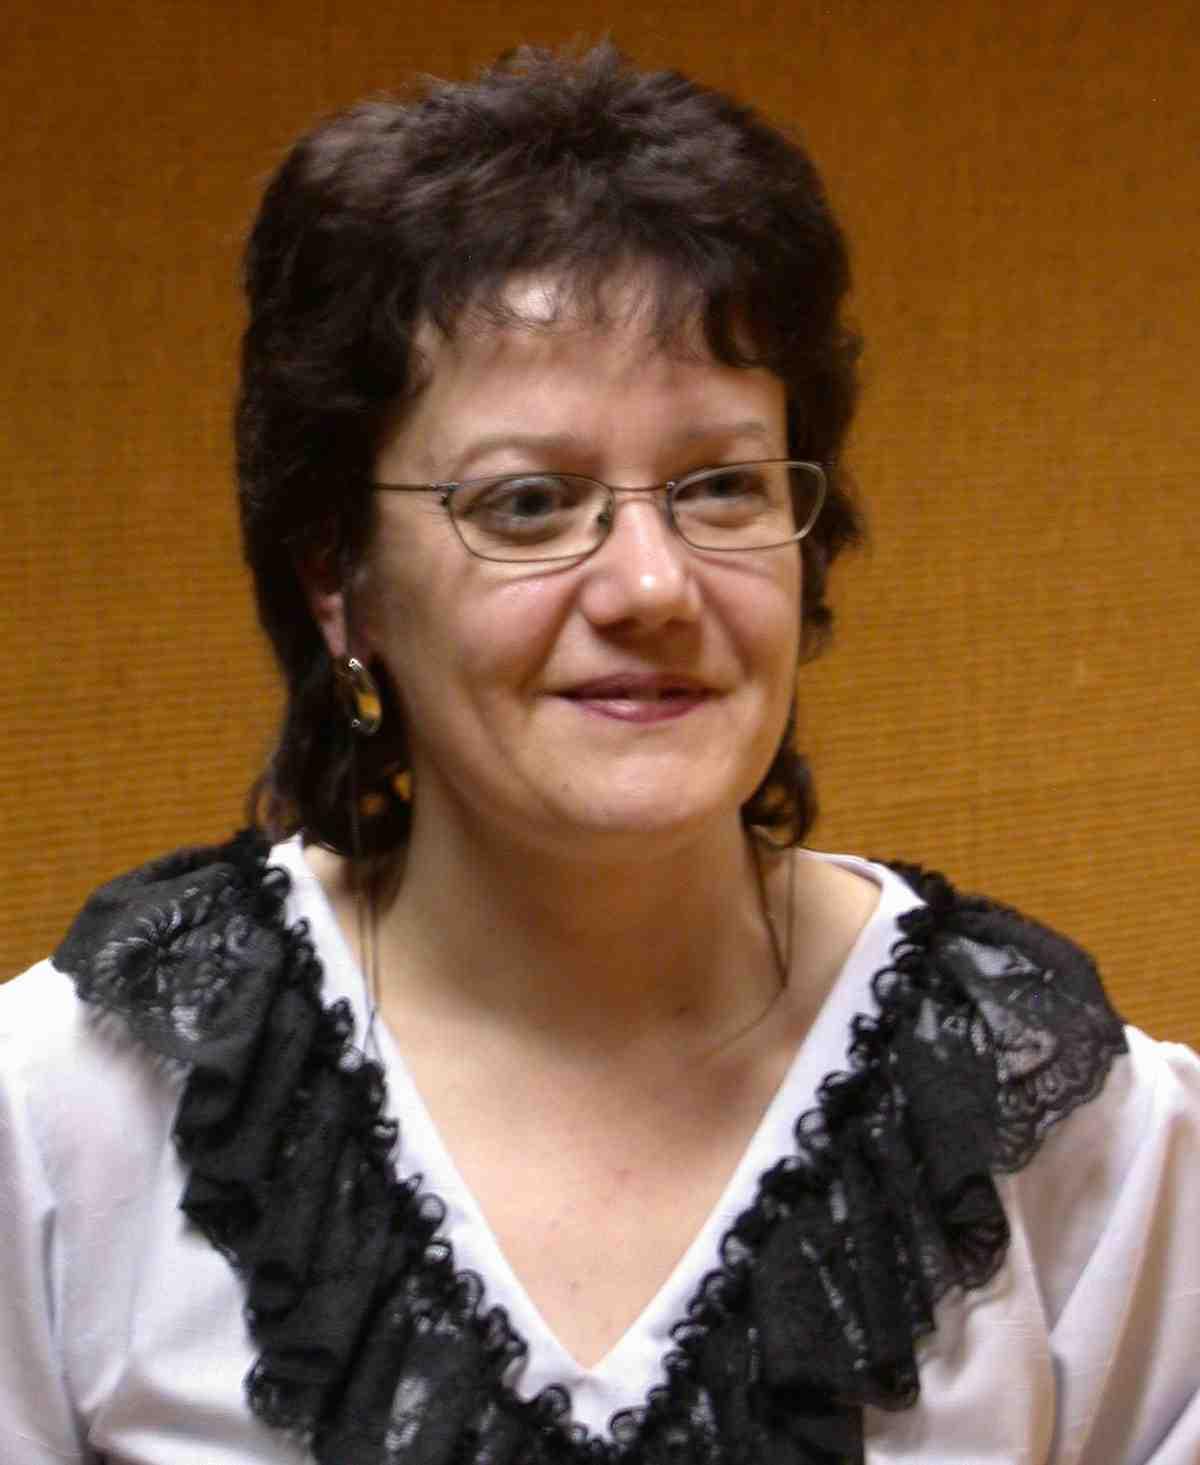 Barbara König - barbara-koenig-photo